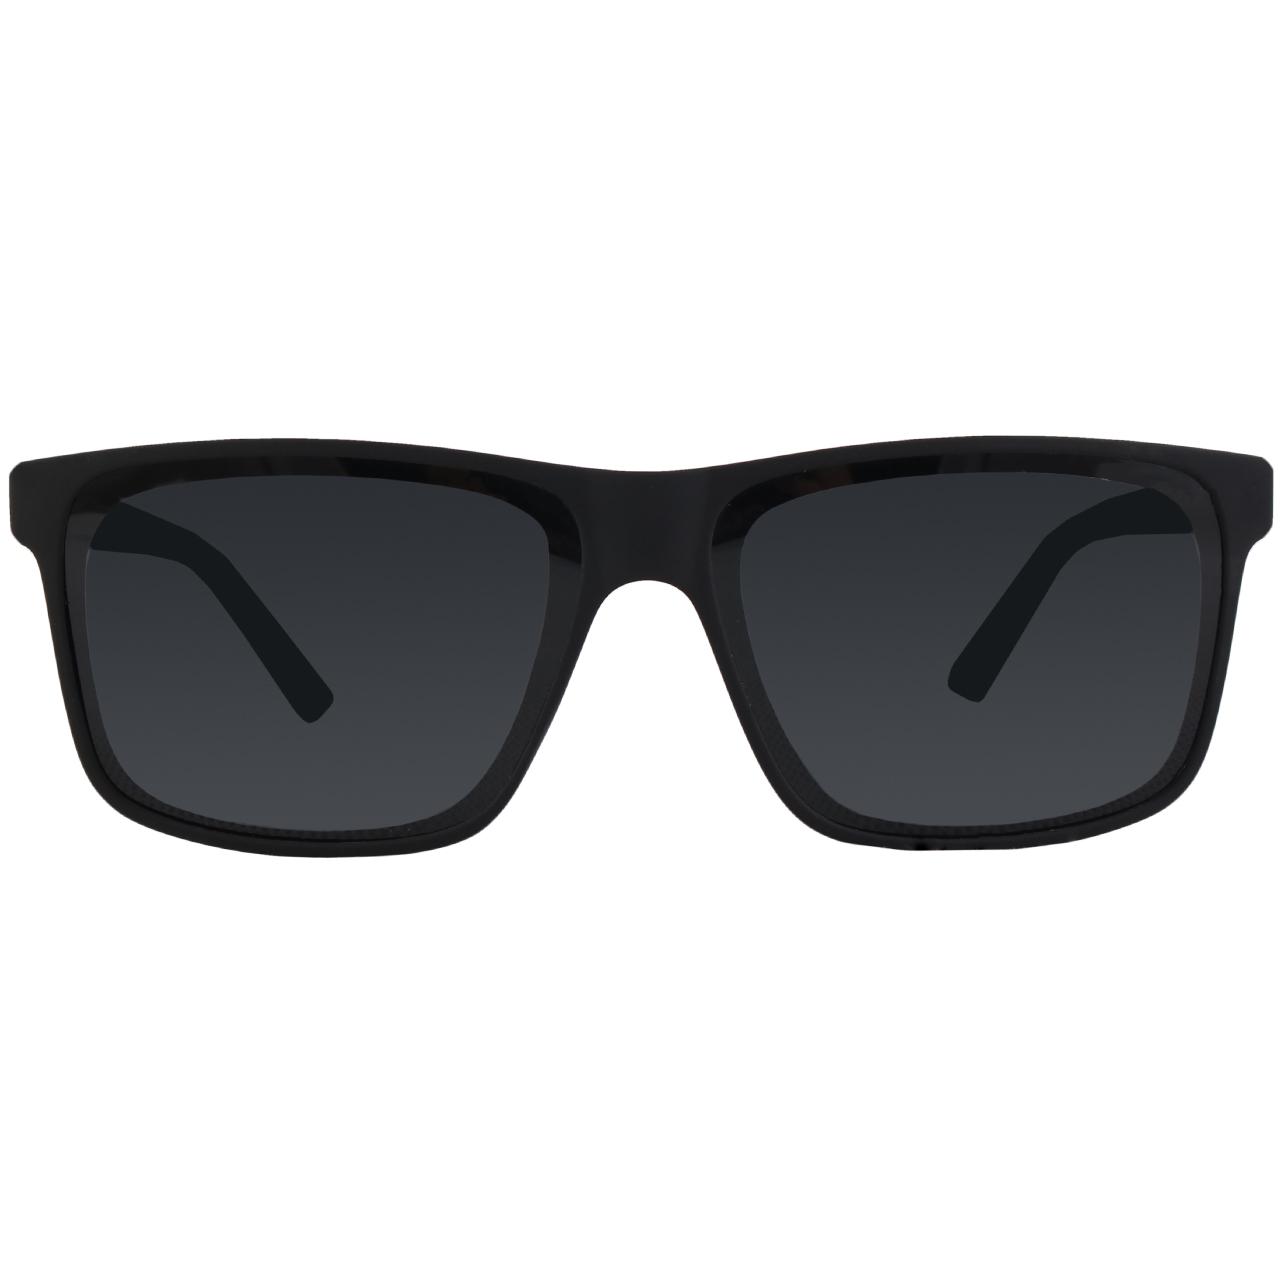 عینک آفتابی مدل A-318